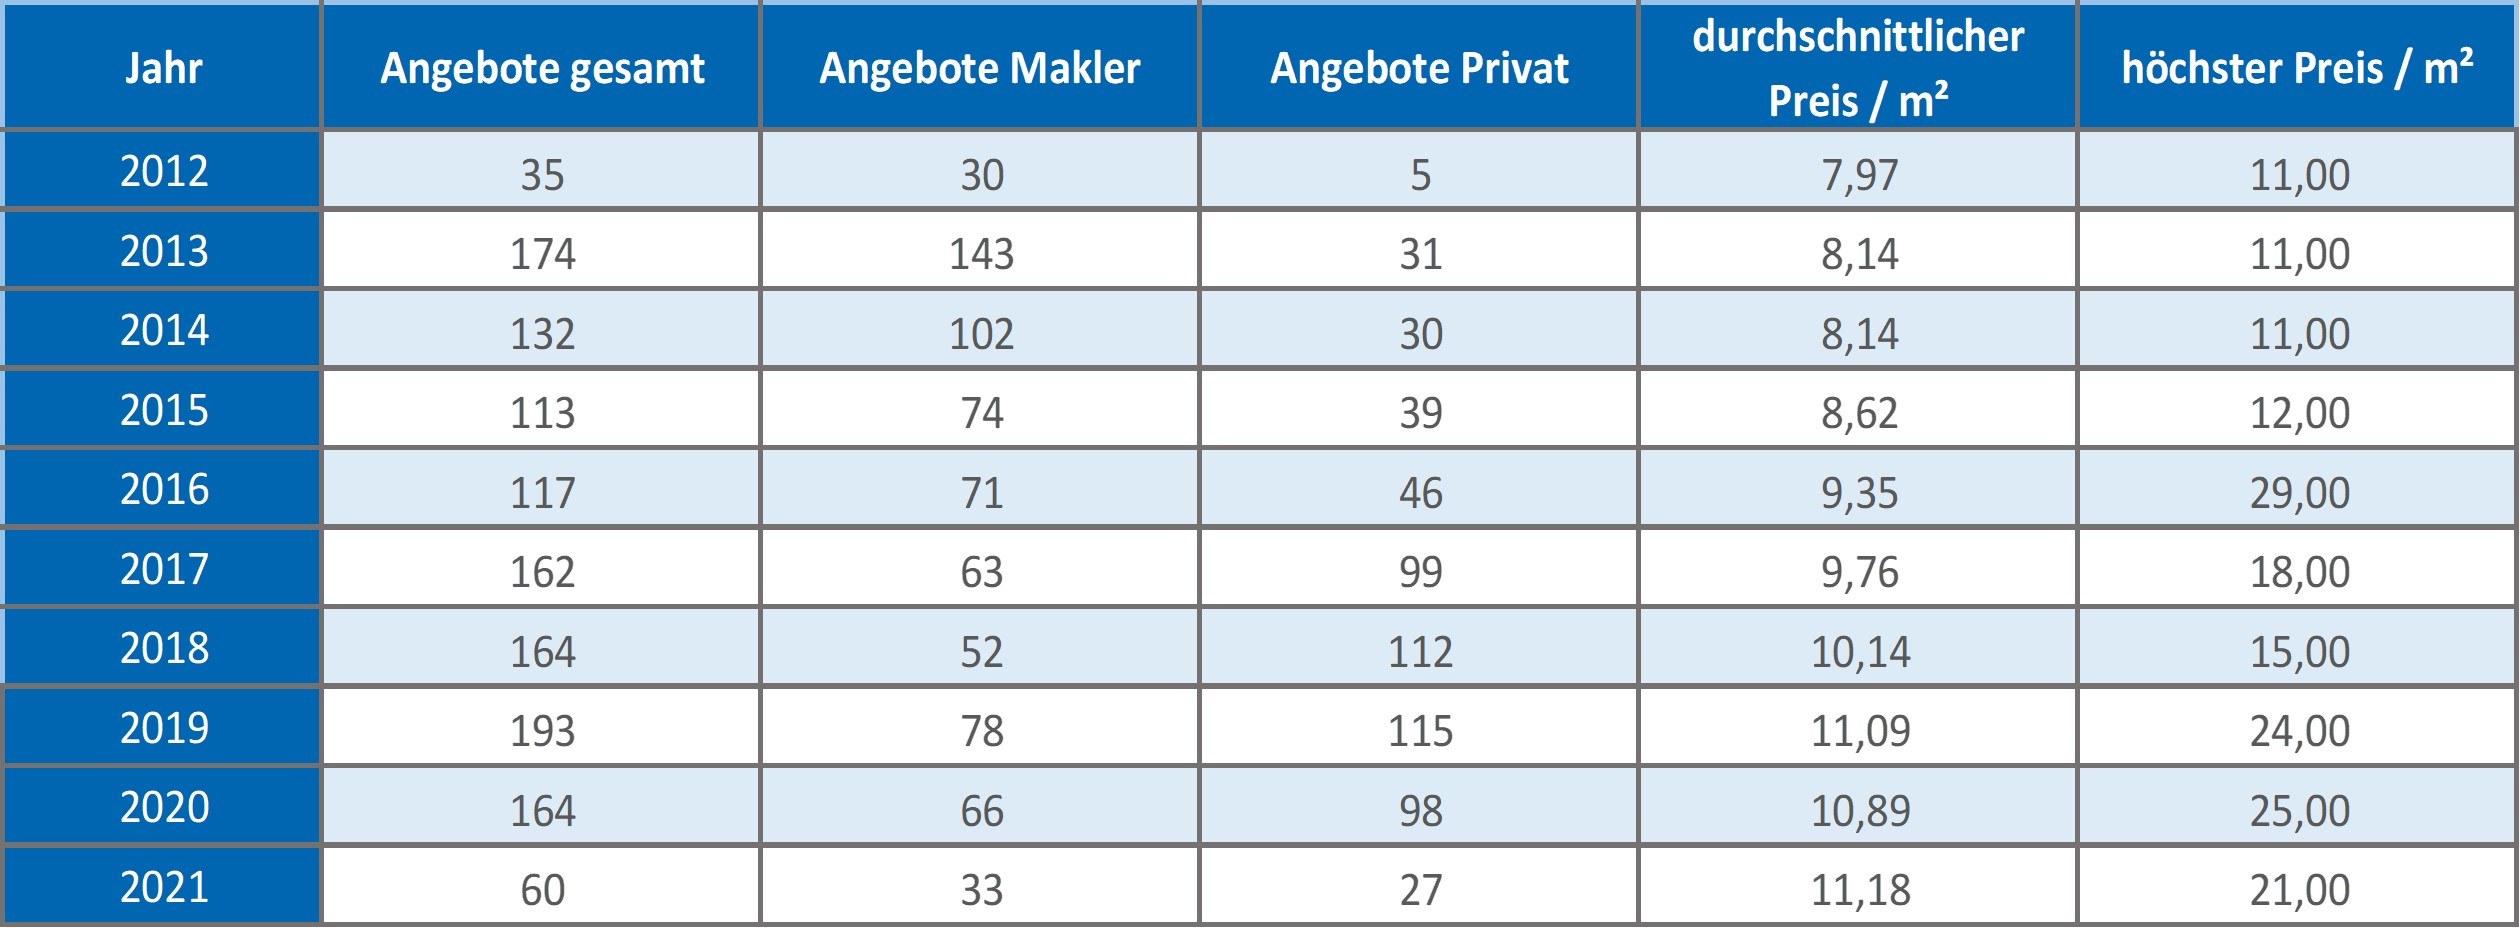 Stephanskirchen Mietpreise mieten vermieten Preis Bewertung Makler 2019 2020 2021 www.happy-immo.de